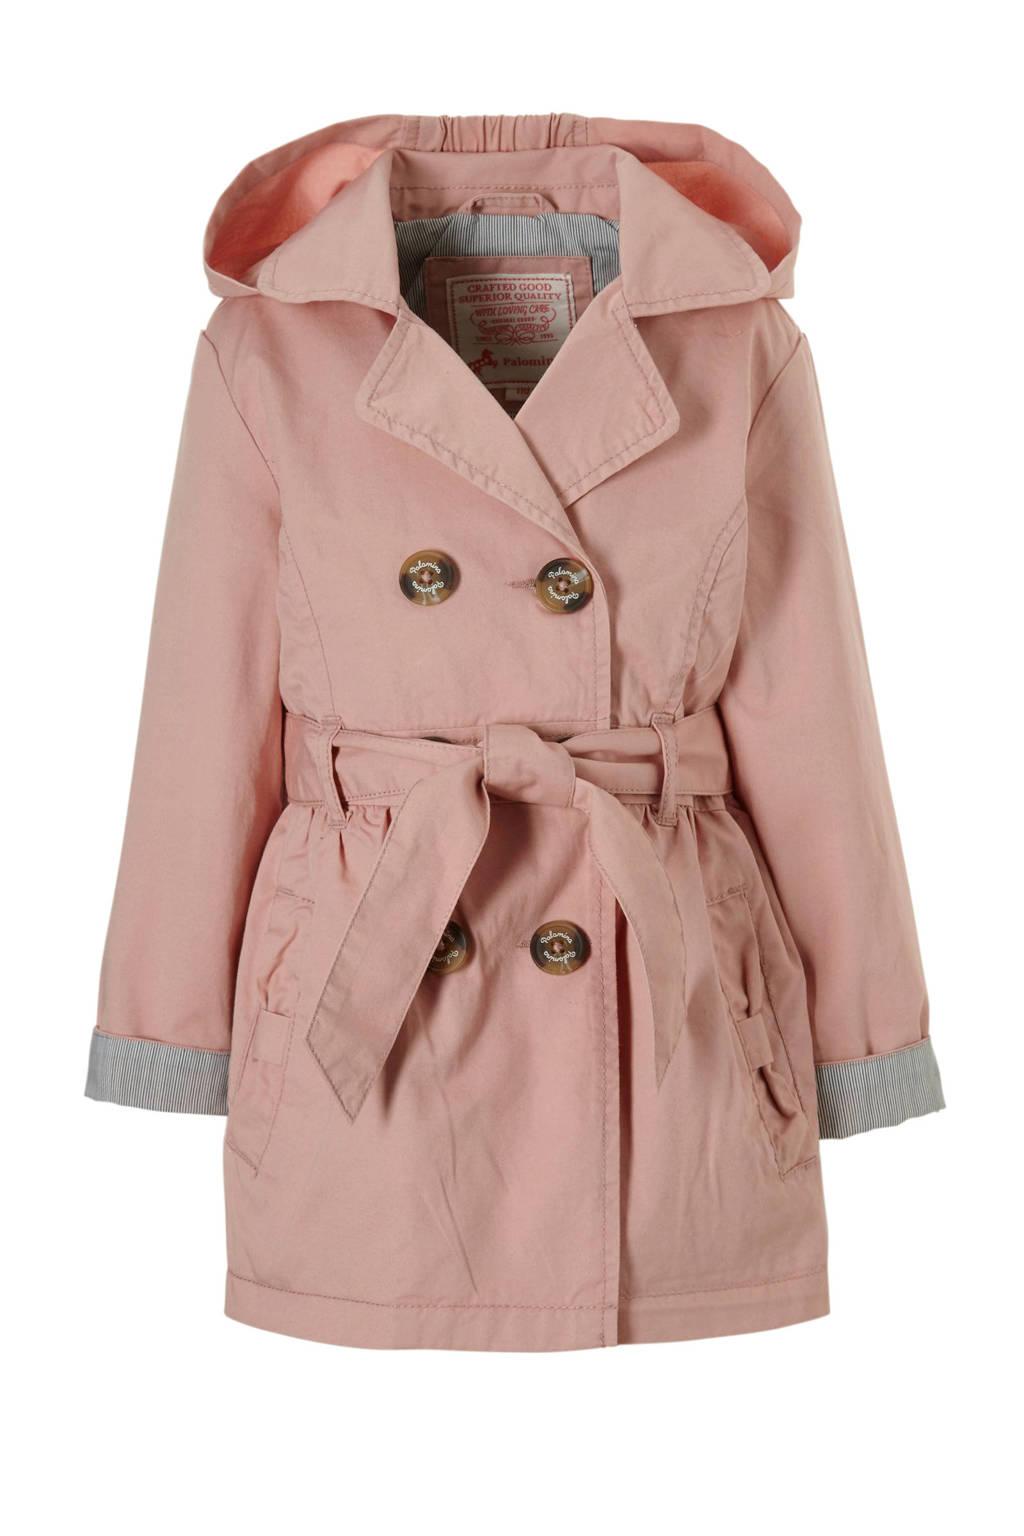 C&A Palomino trenchcoat roze, Oudroze